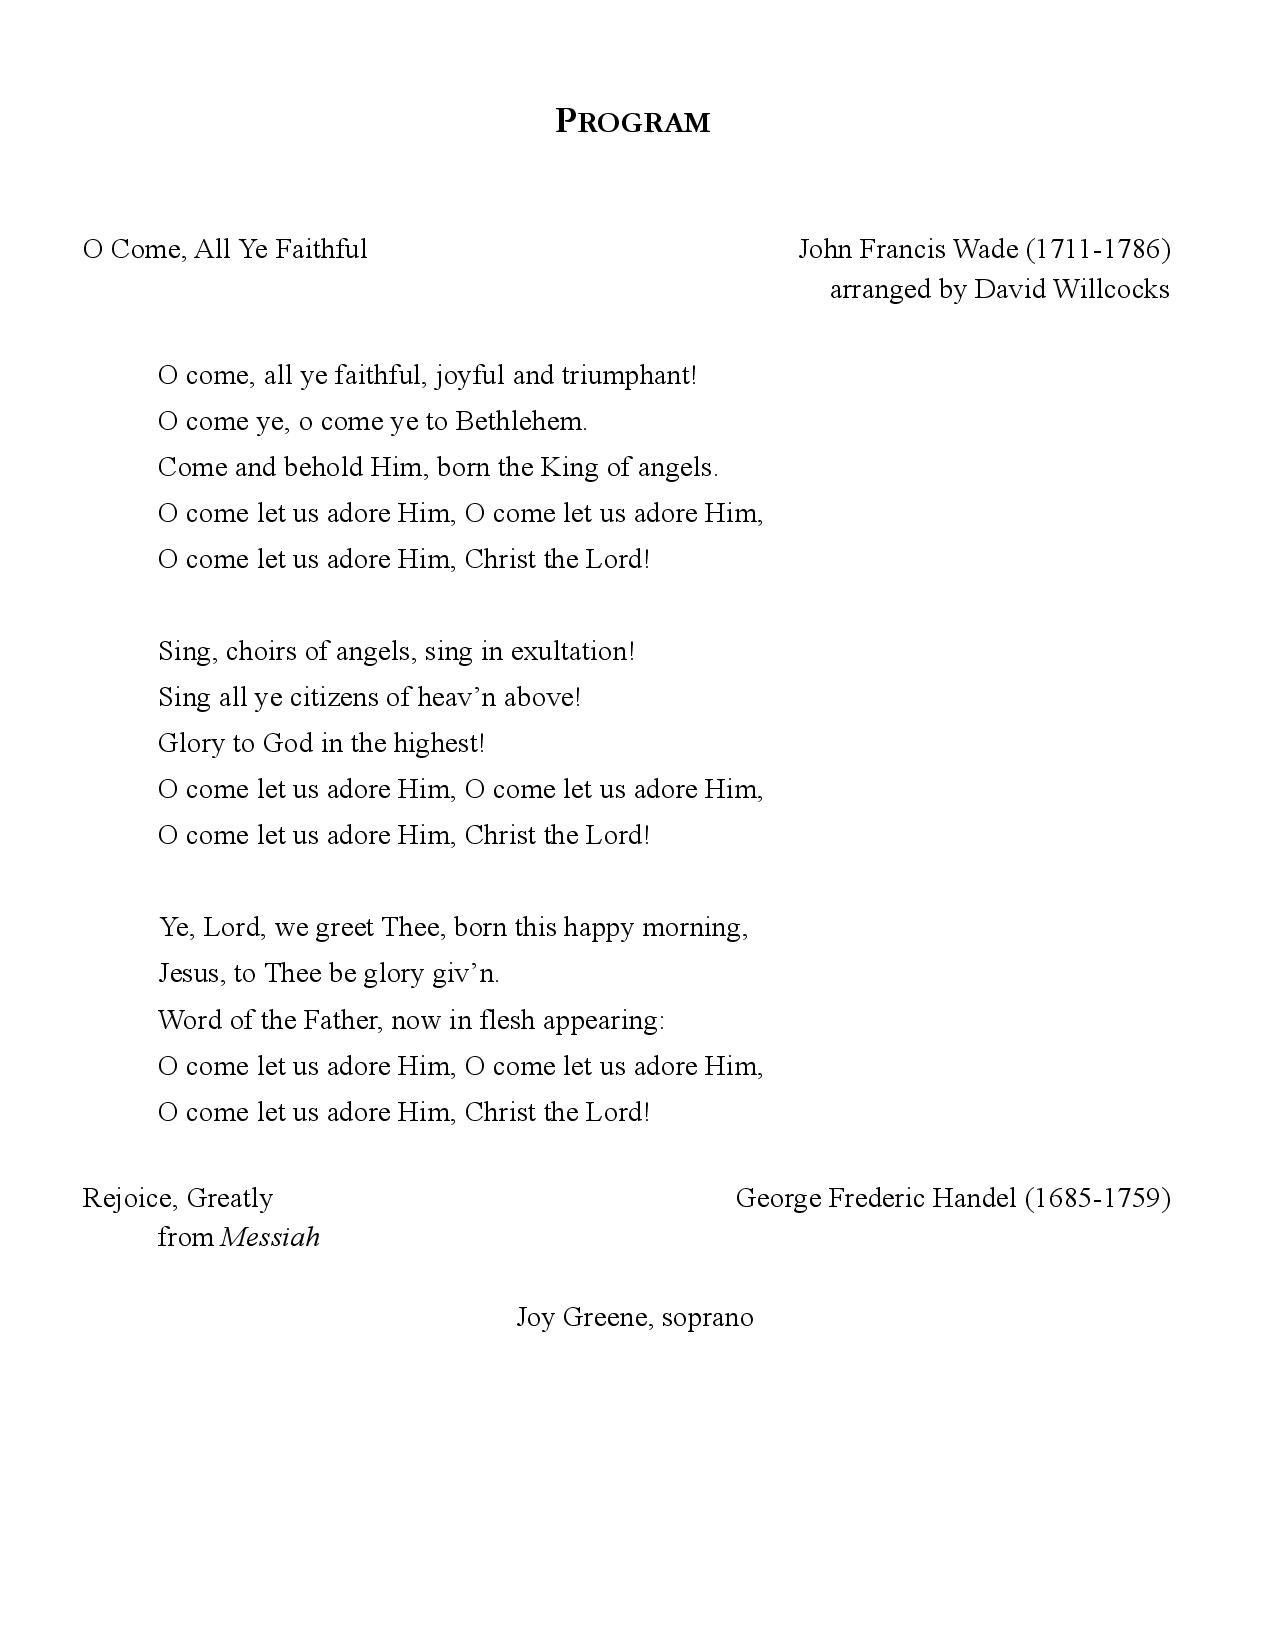 2012-12-16 Program Draft - 2012-12-11 v2-page-003.jpg